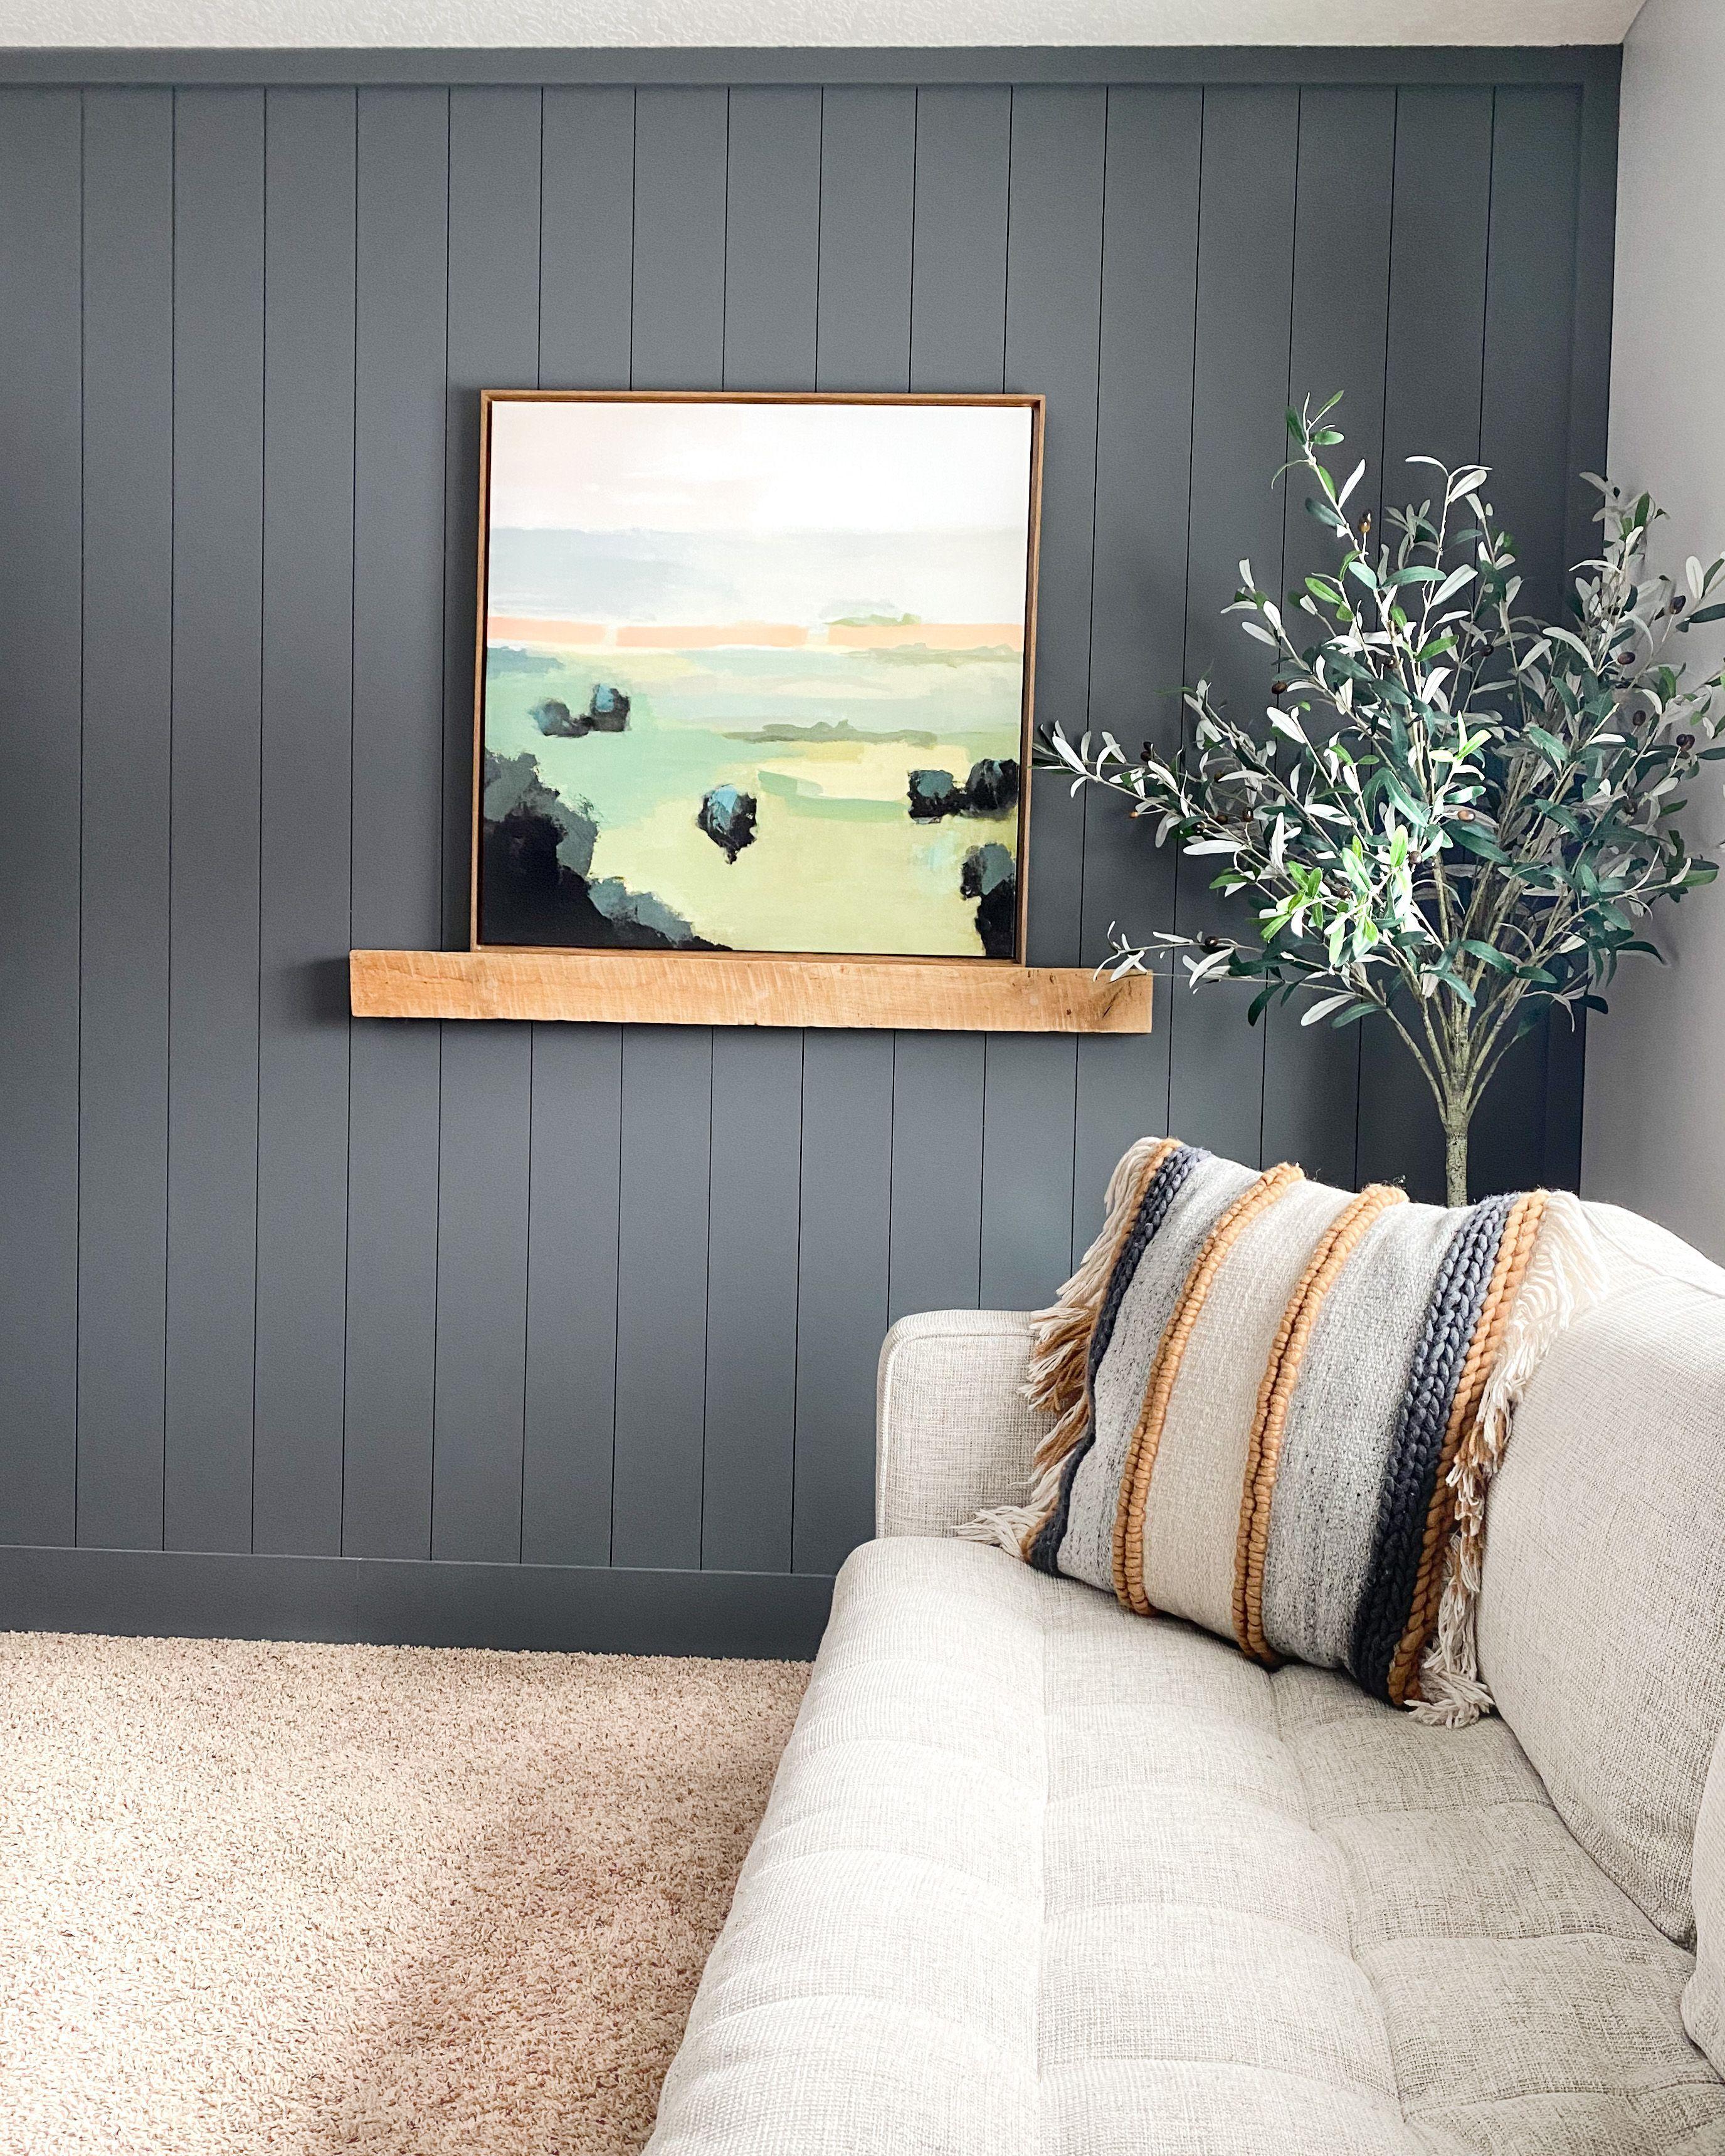 Vertical Shiplap Shiplap Accent Wall Shiplap Living Room Accent Walls In Living Room Shiplap walls in living room